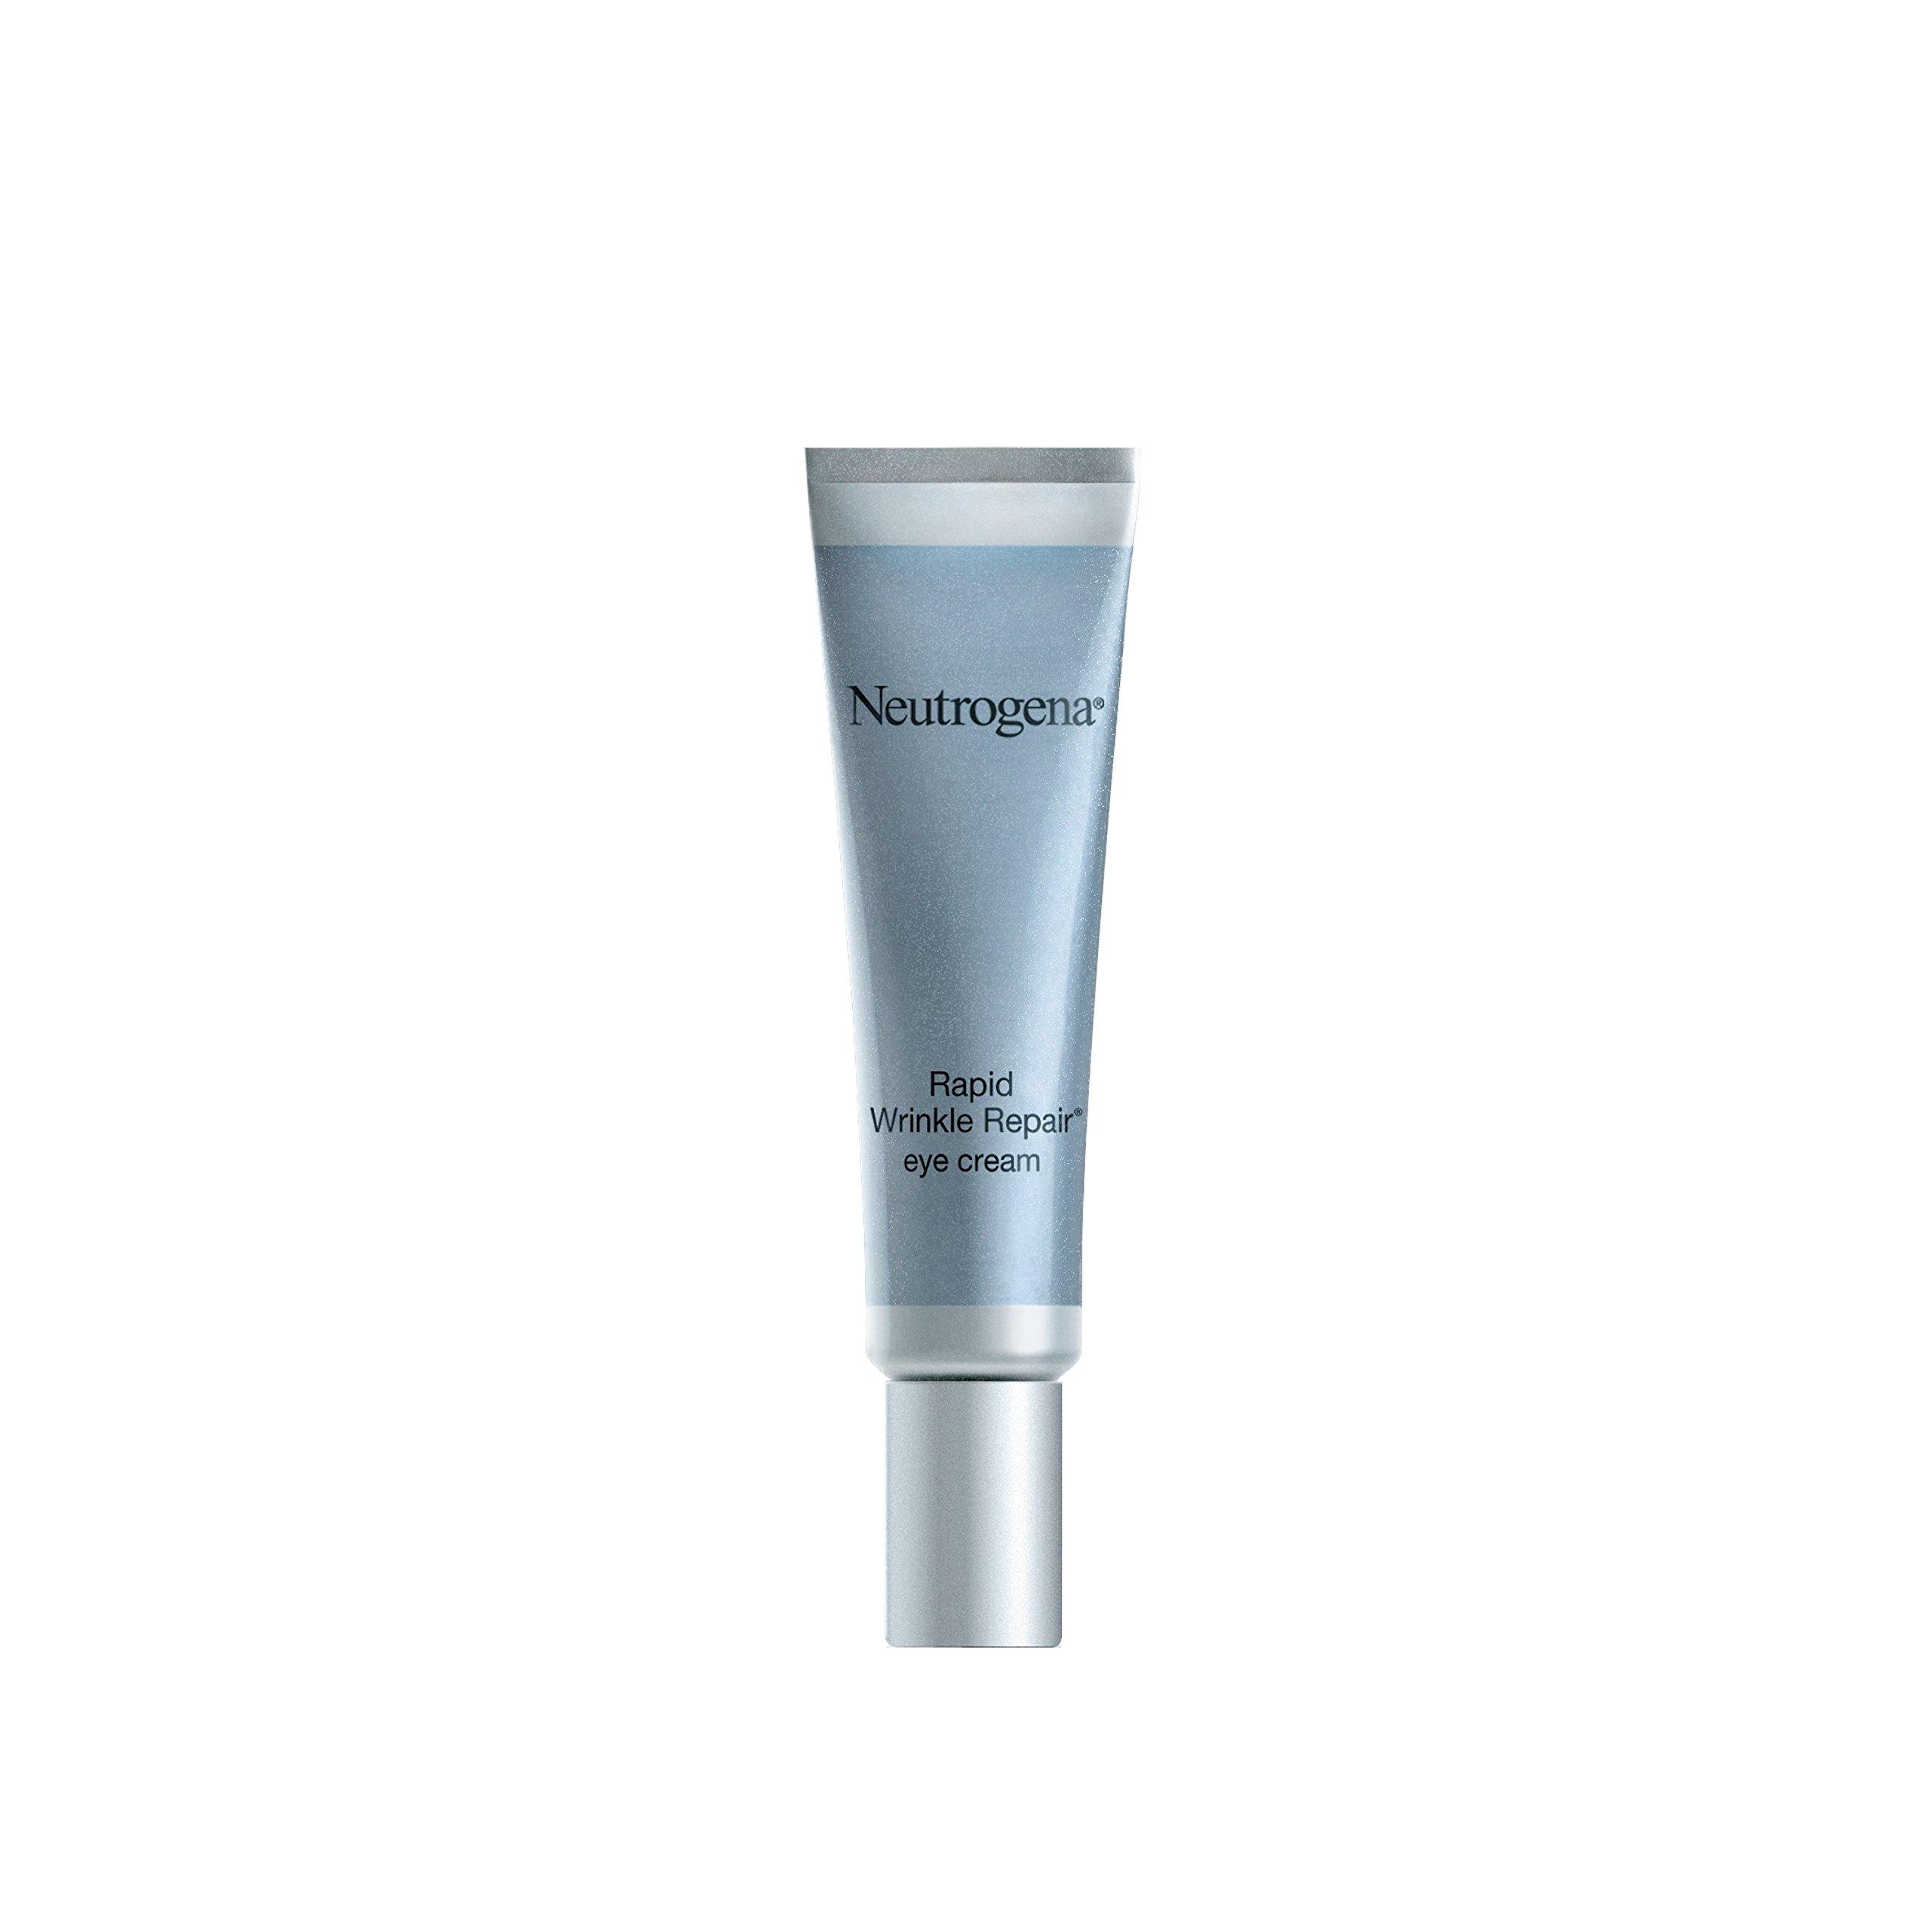 Neutrogena Rapid Wrinkle Repair Anti-Wrinkle Eye Cream with Retinol SA, Hyaluronic Acid, and Glucose Complex Retinol Booster, 0 .5 fl. oz